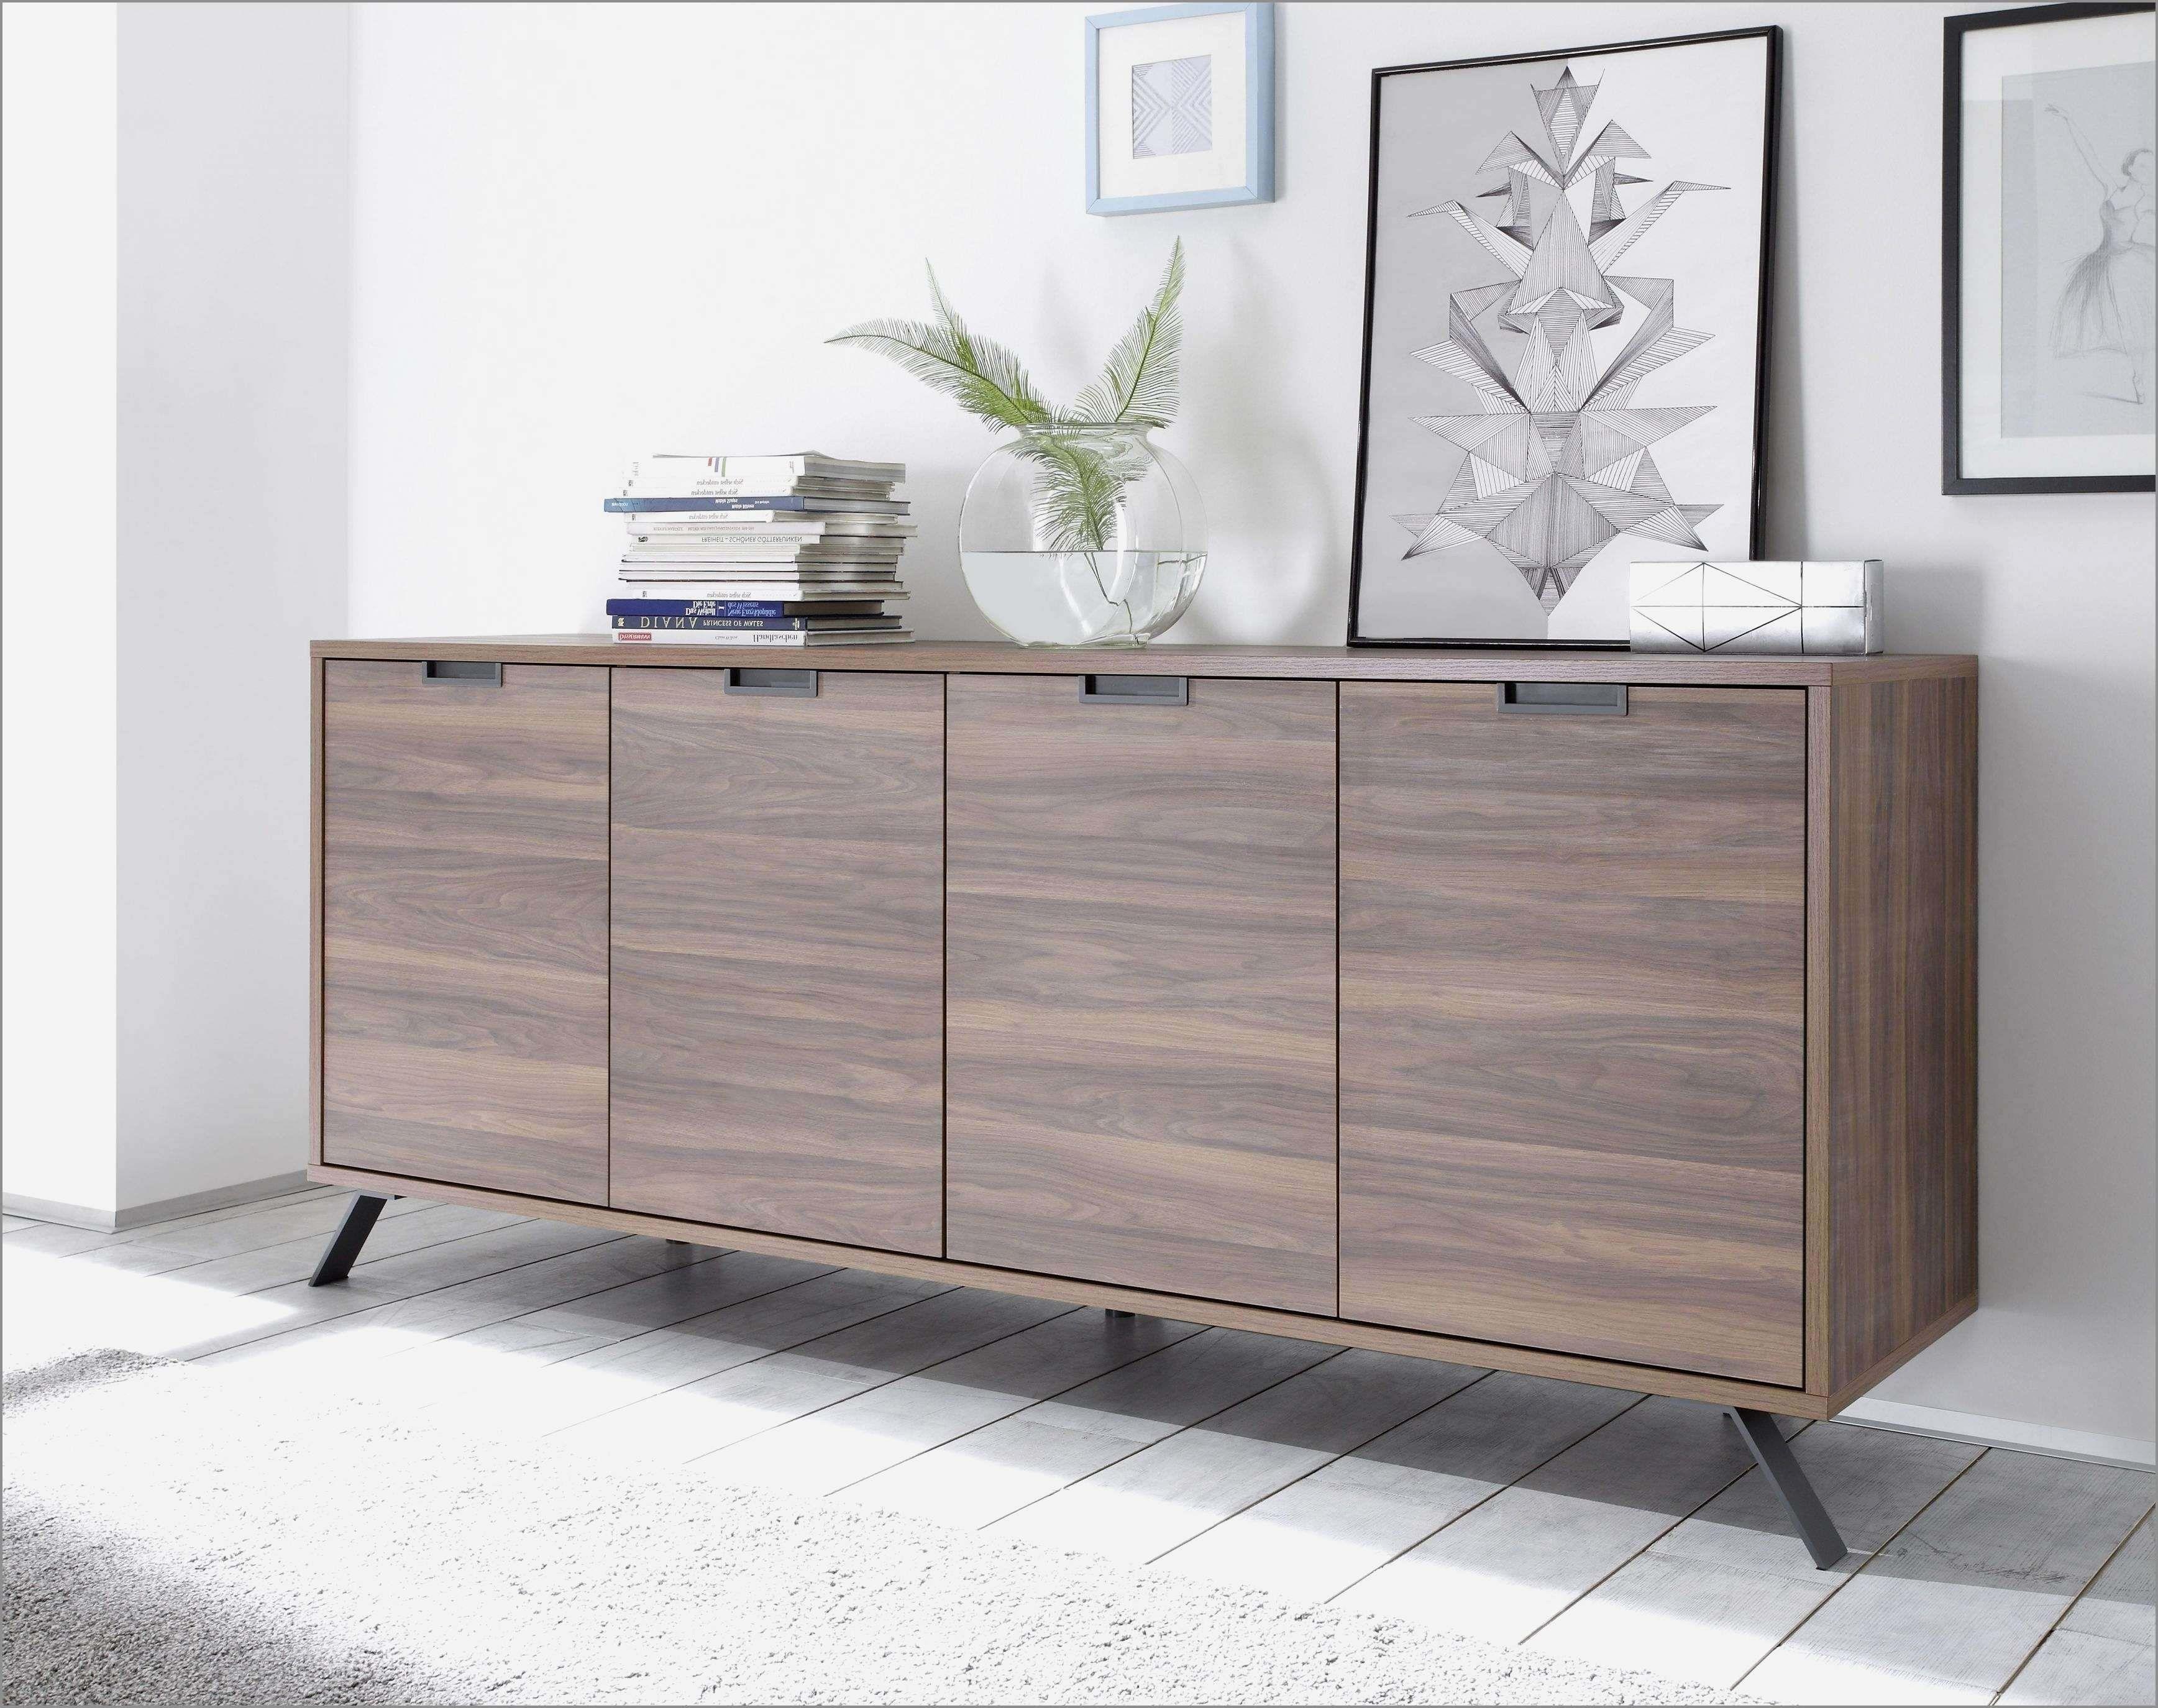 32 Inspirierend Kuchen Unterschrank 50 Cm Weiss Furniture Decor Home Decor